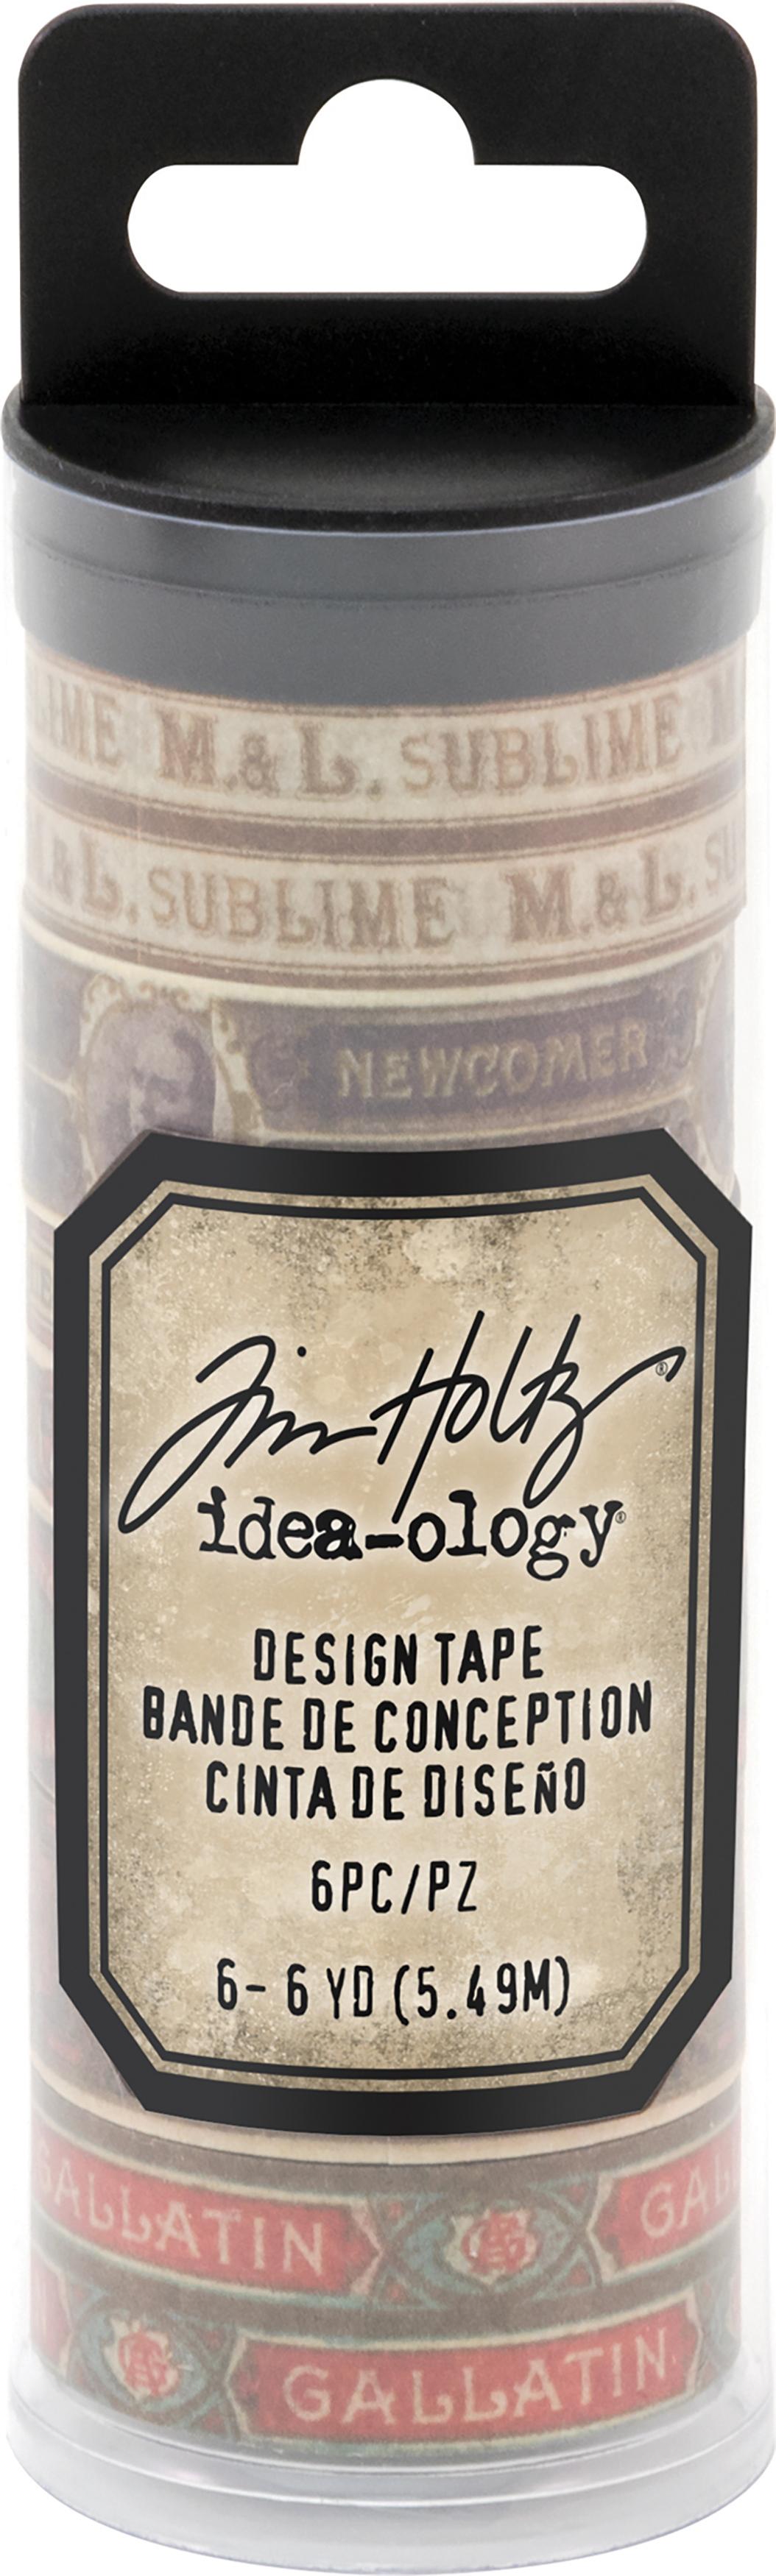 Design Tape - Humidor